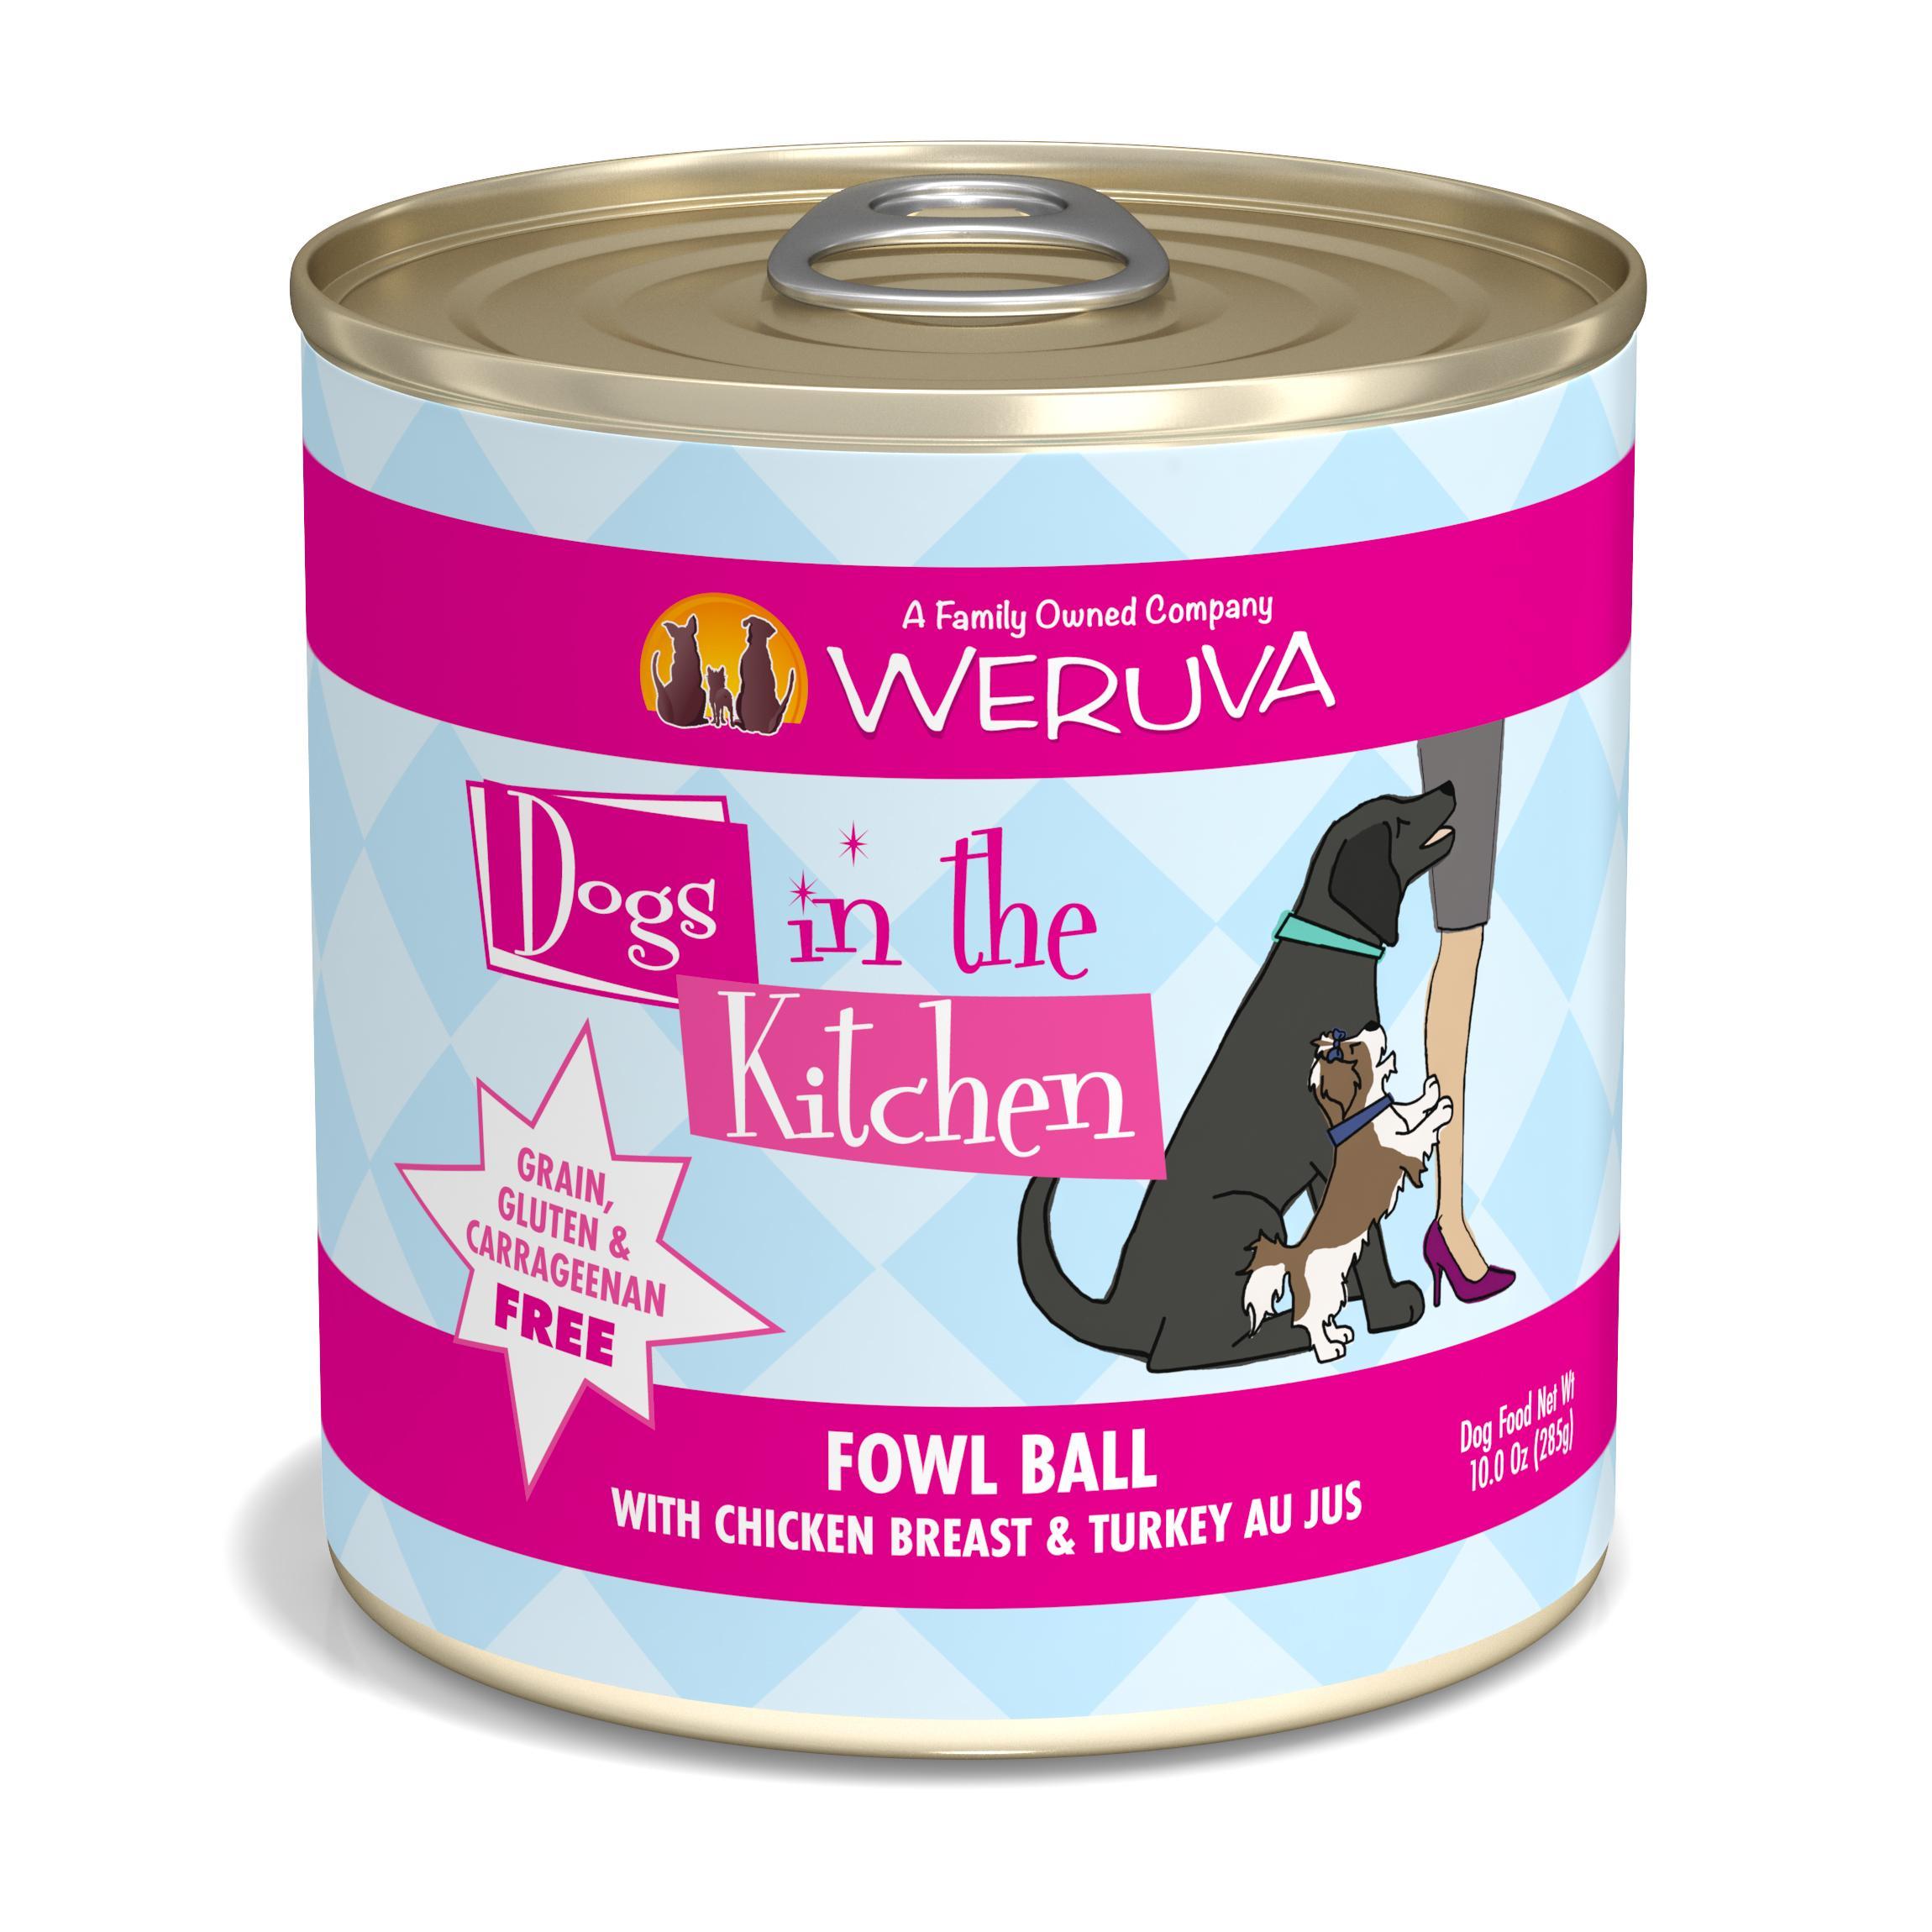 Weruva Dogs in the Kitchen Fowl Ball with Chicken Breast & Turkey Au Jus Grain-Free Wet Dog Food, 10-oz can